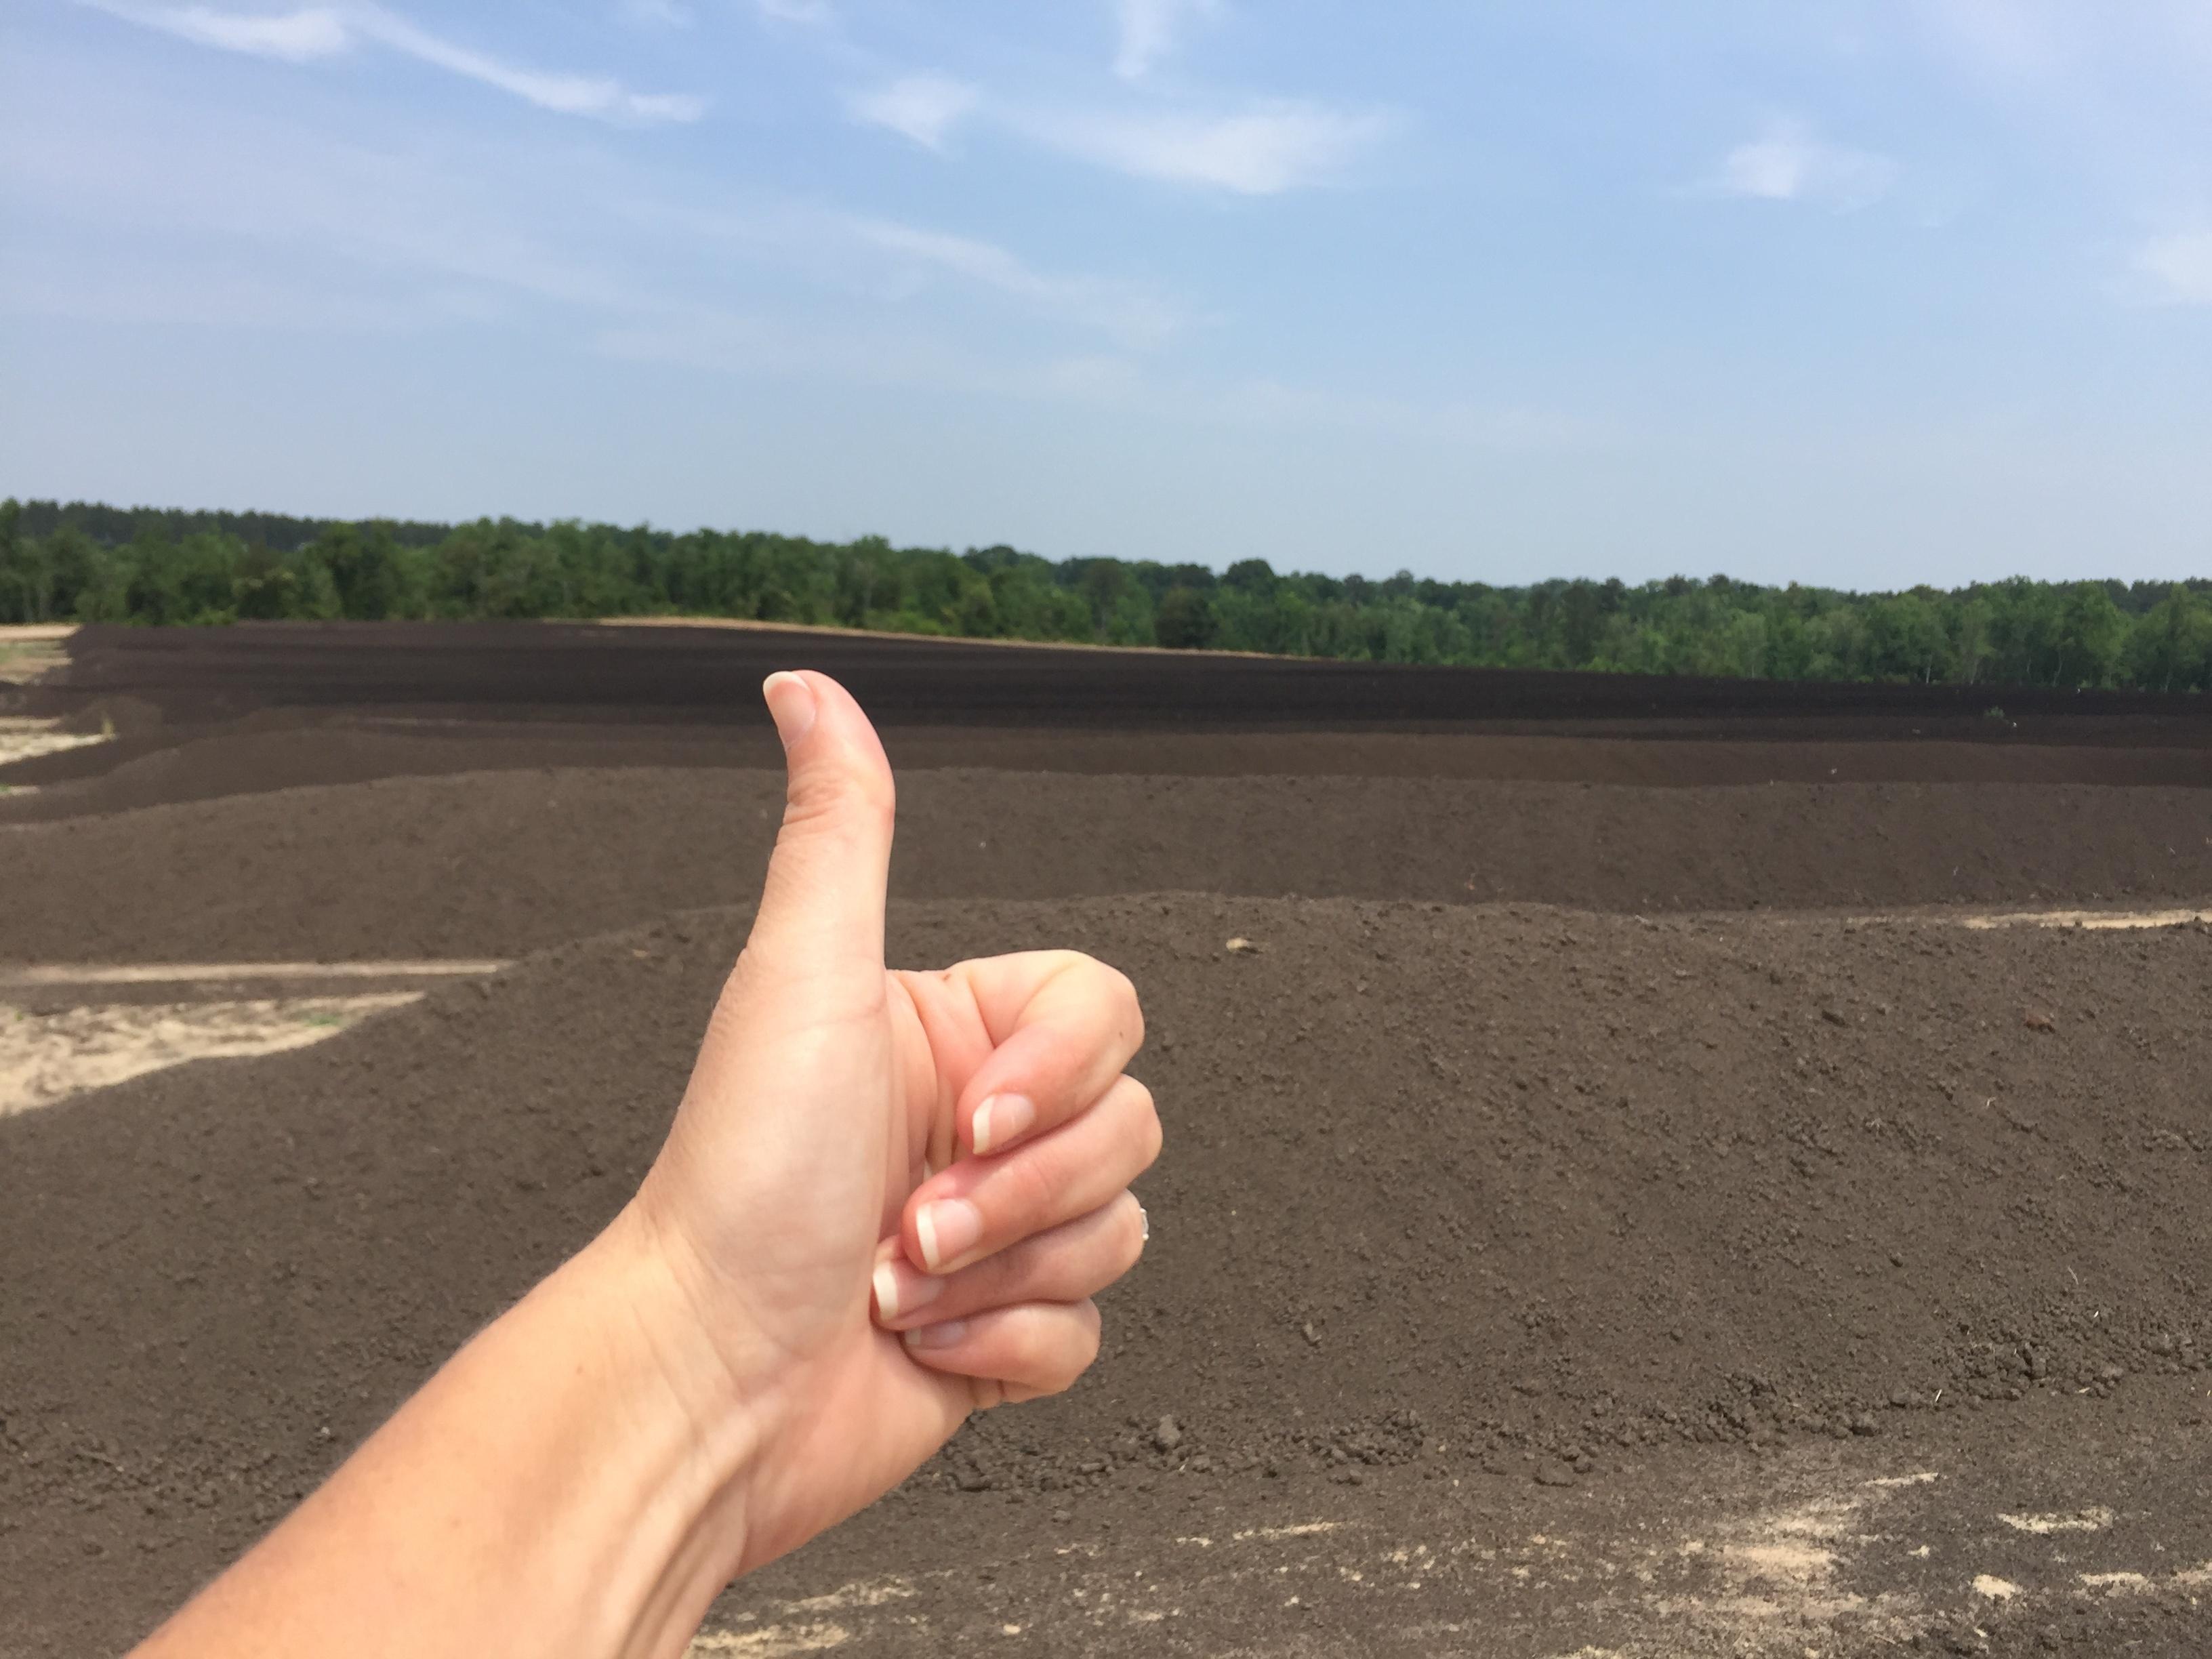 Super-Sod Soil3 thumbs up